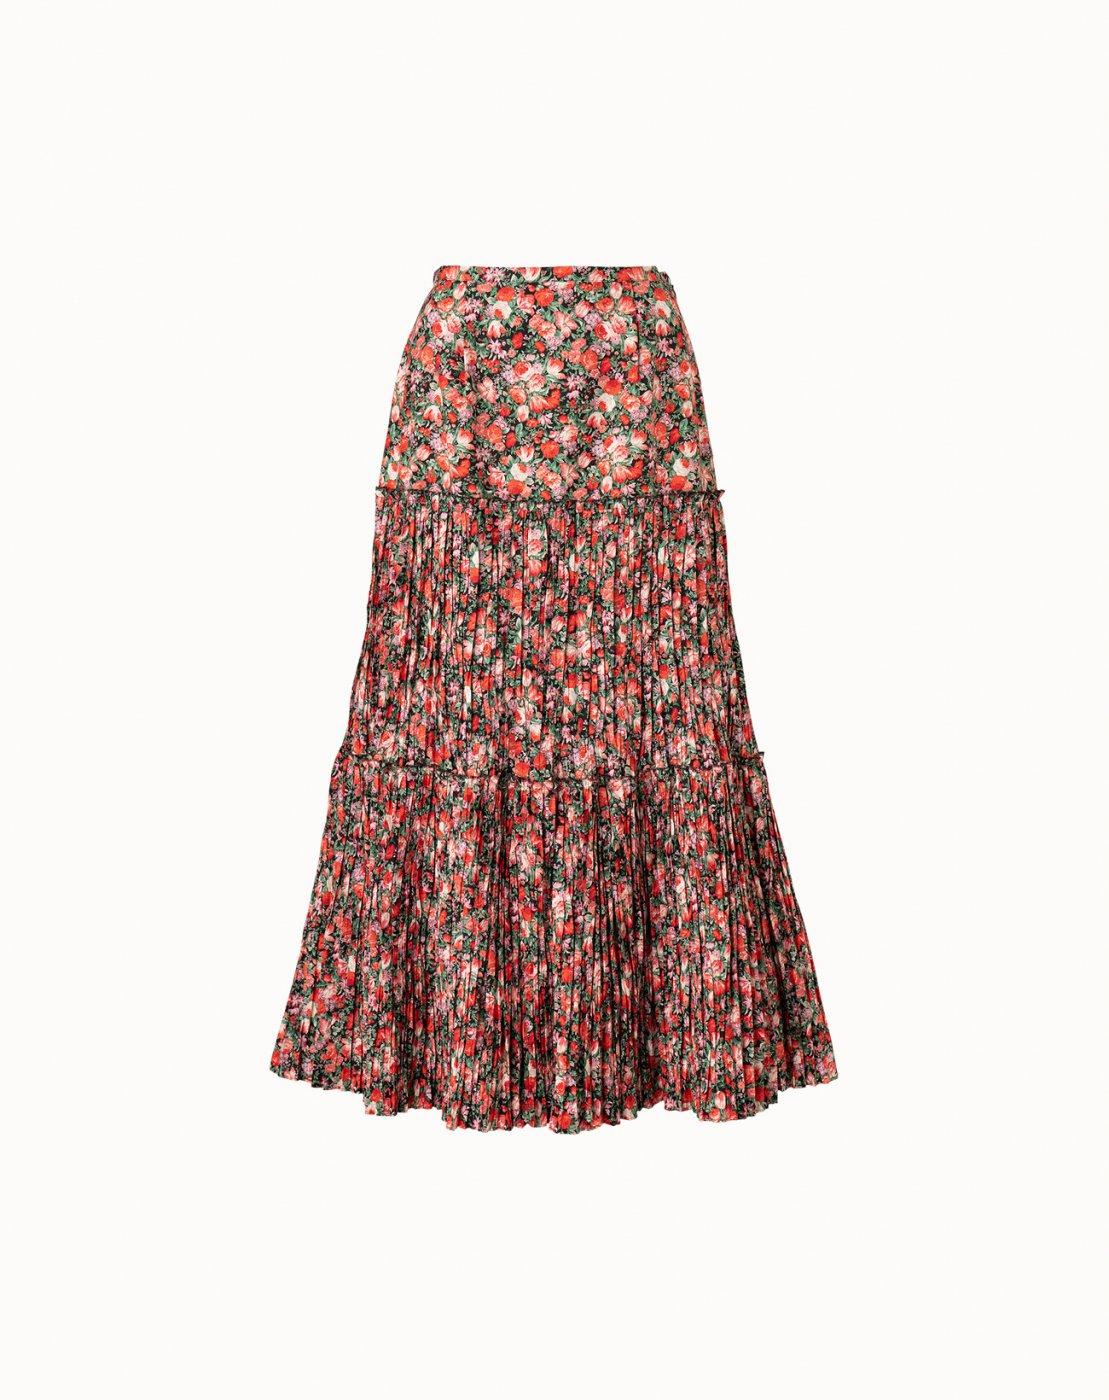 leur logette - Matisse Flower Print Pleats Skirt - Red